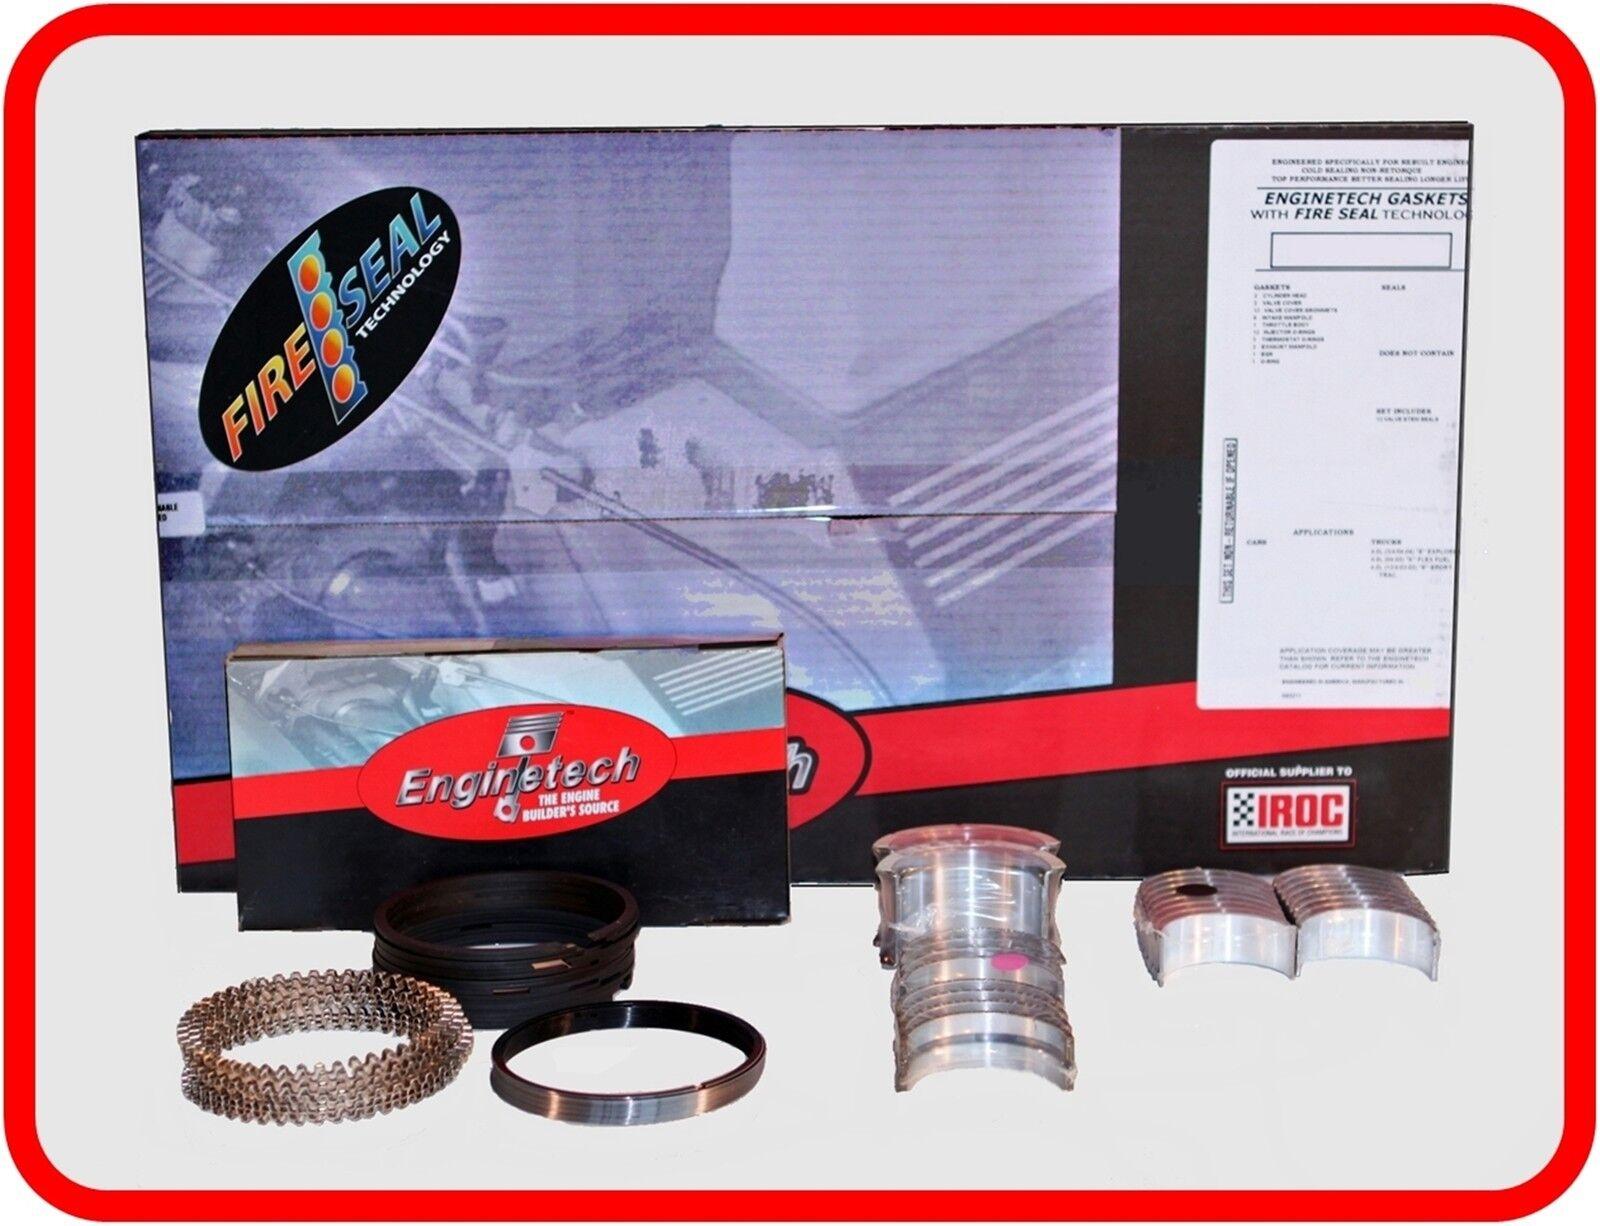 Engine Full Gasket Set Bearings Rings Fits 06-11 Subaru Impreza 2.5L SOHC 16v